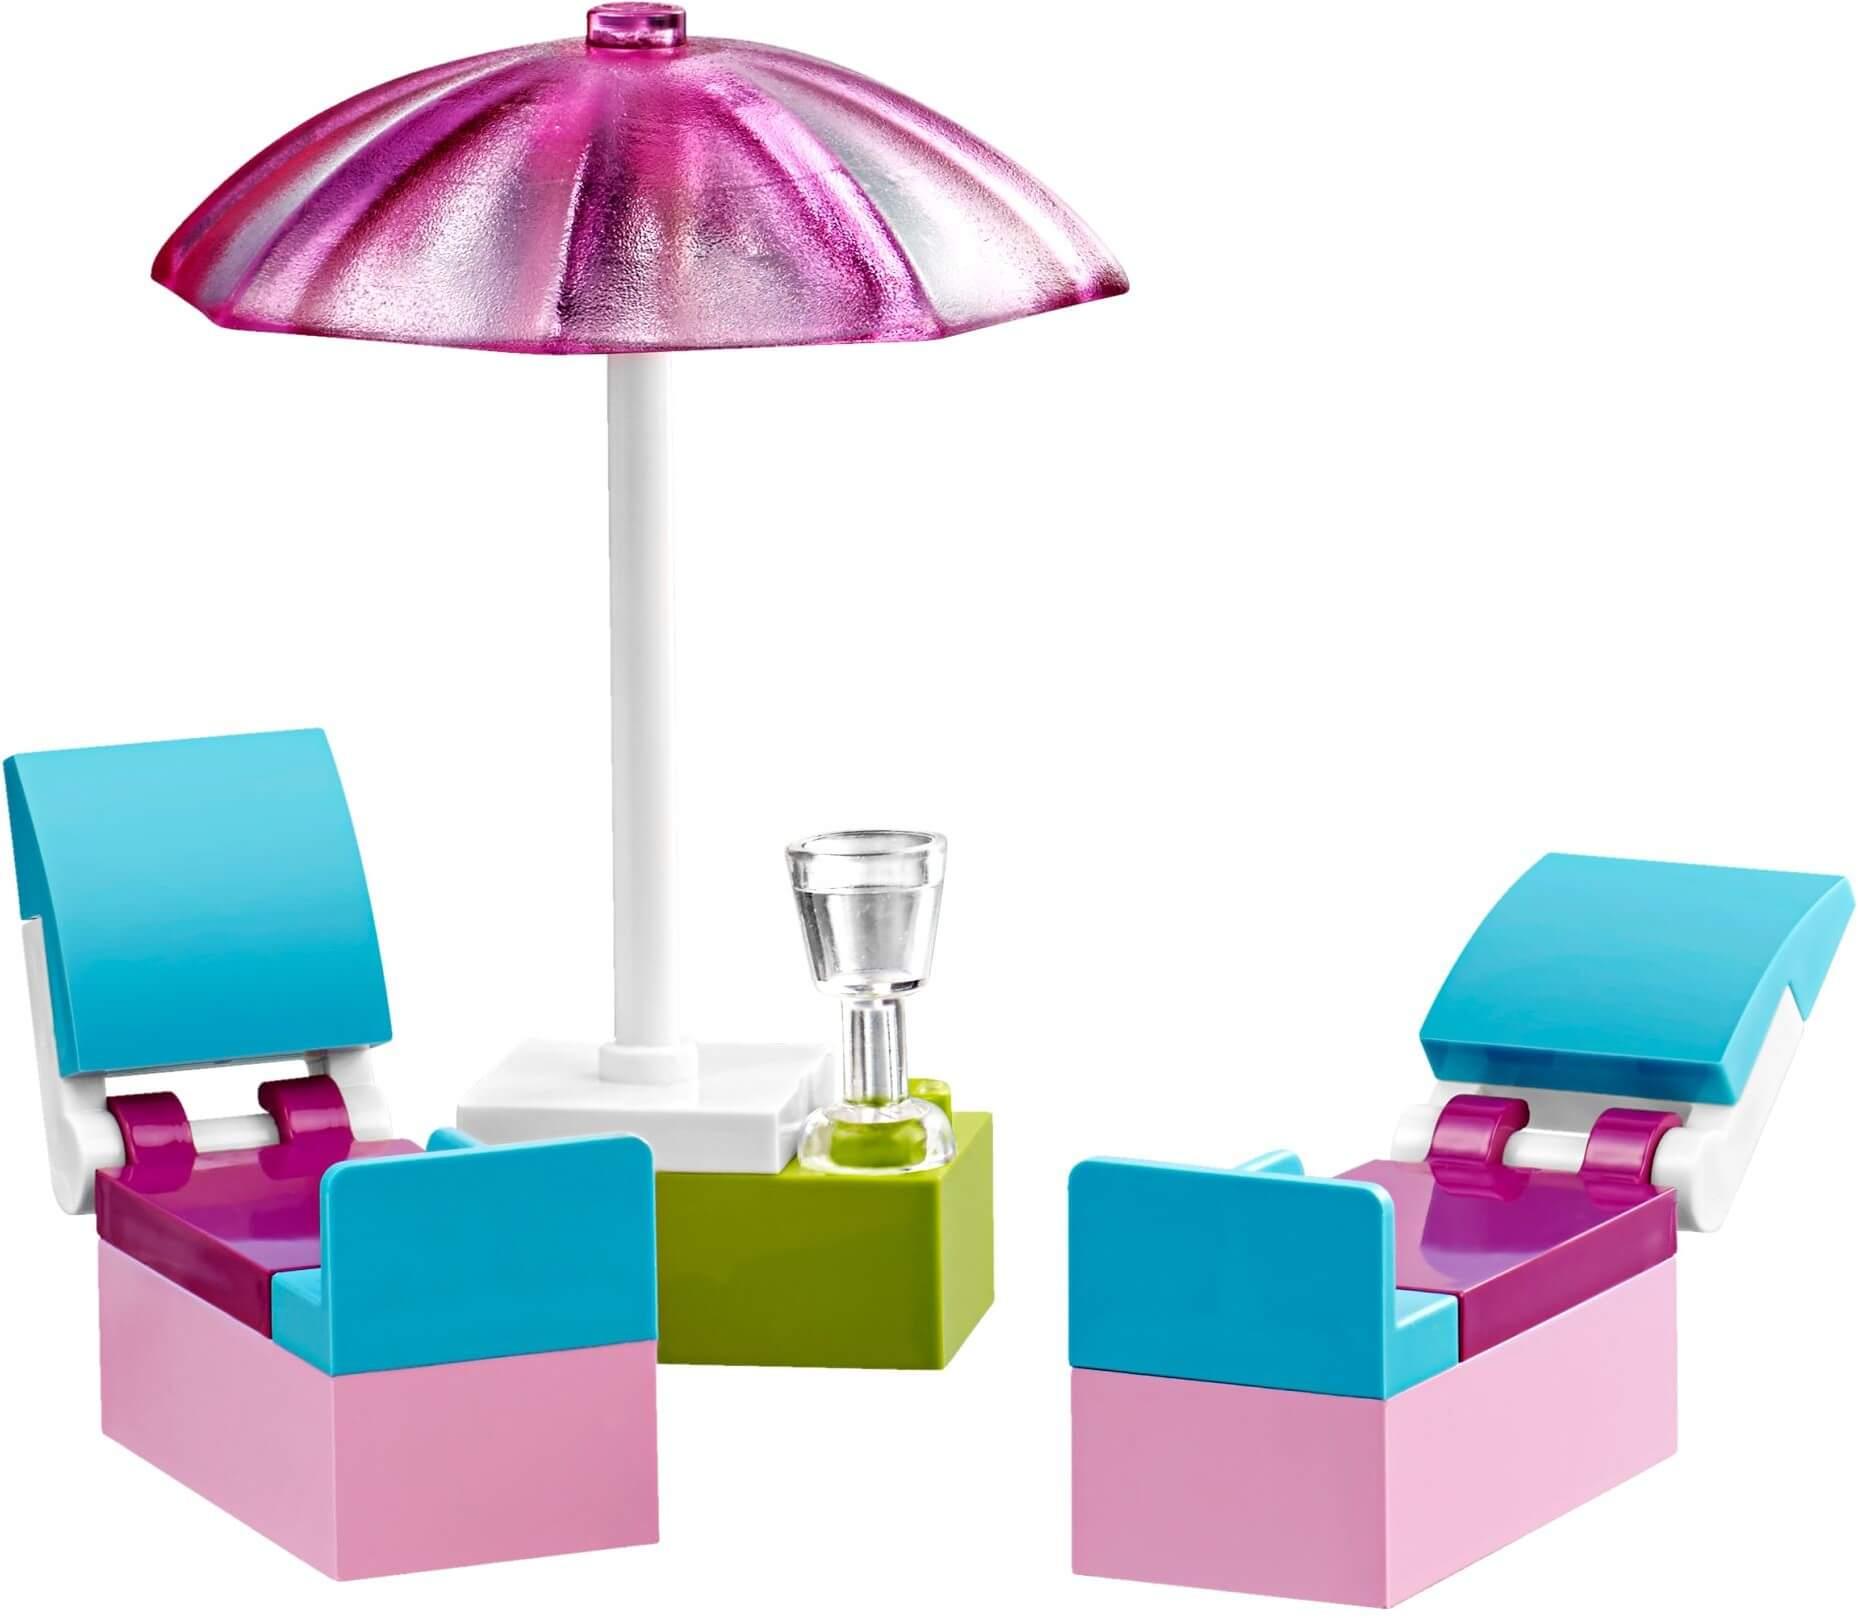 Mua đồ chơi LEGO 10747 - LEGO Juniors 10747 - Du Thuyền Bãi Biển của Andrea và Stephanie (LEGO 10747 Andrea & Stephanie's Beach Holiday)